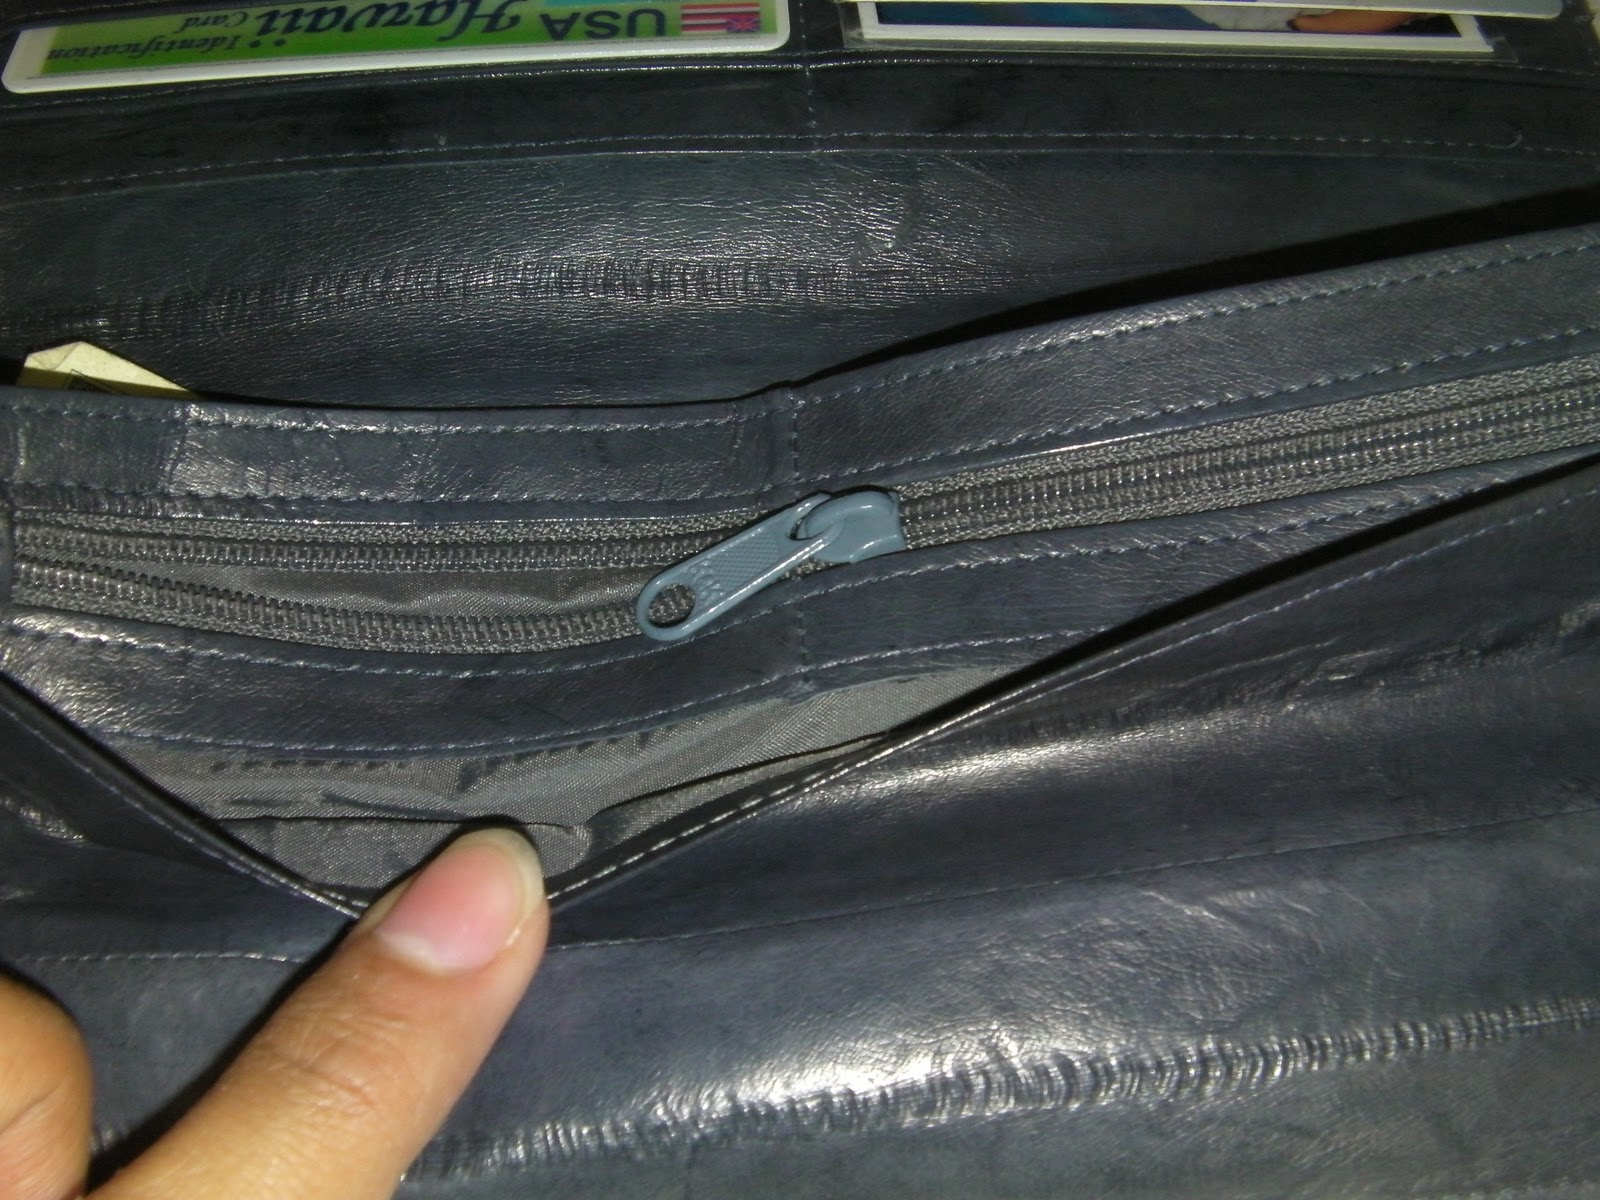 Eel skin coin purse repair : Bitcoin and ripple news